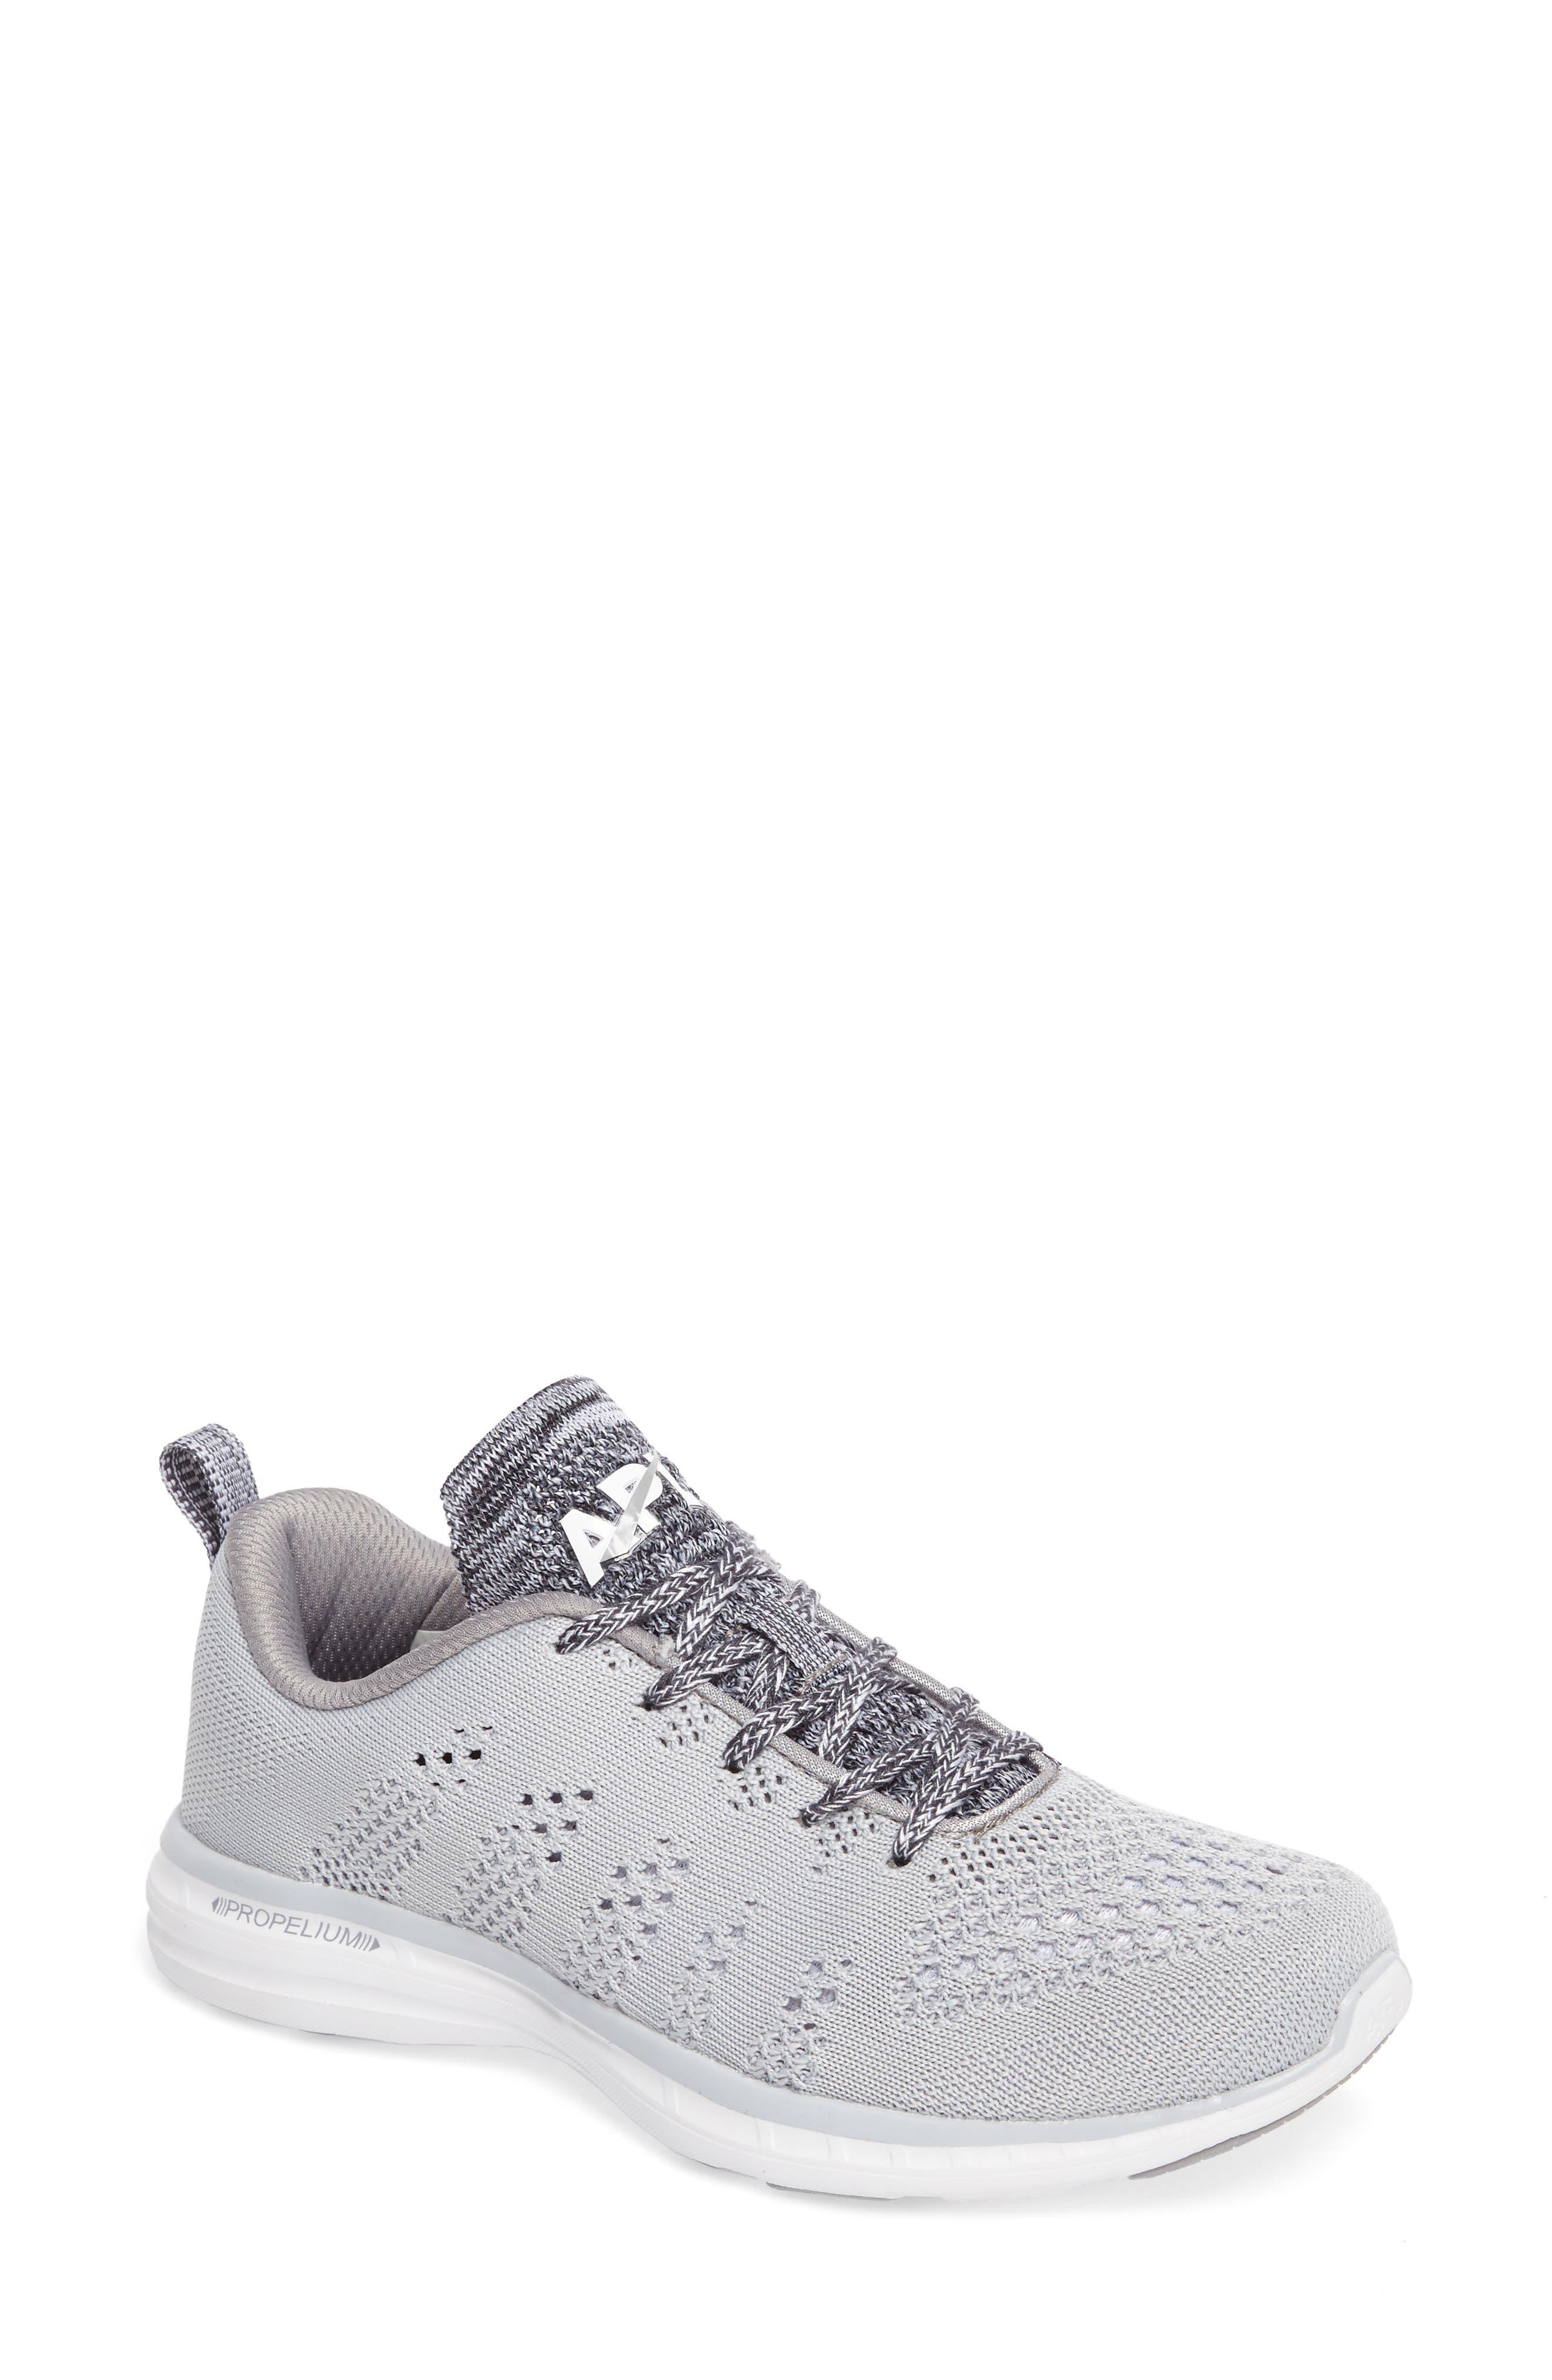 Nike Banque Tr Flyknit Nordstrom Gratuit